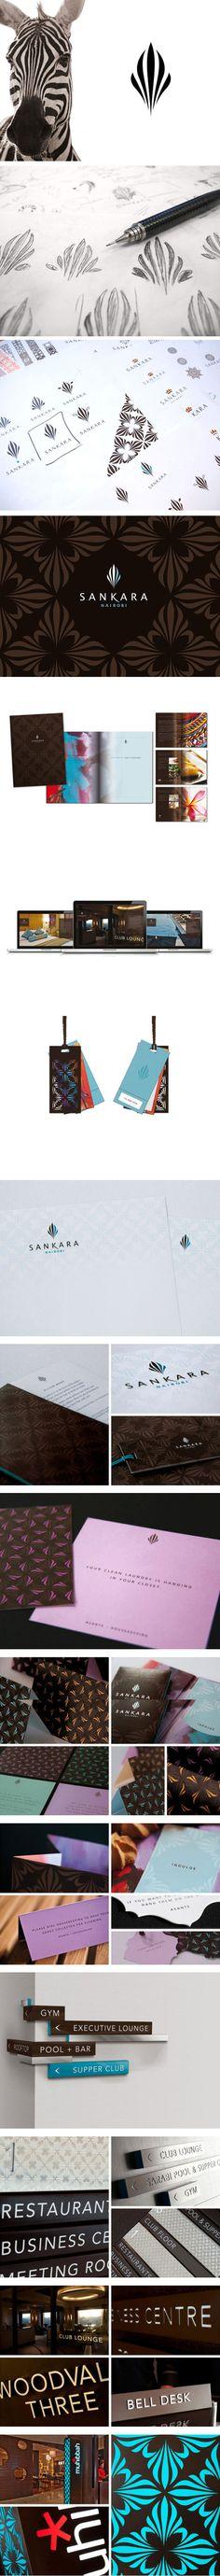 Sankara Hotel image design (original size: 581x6793px)